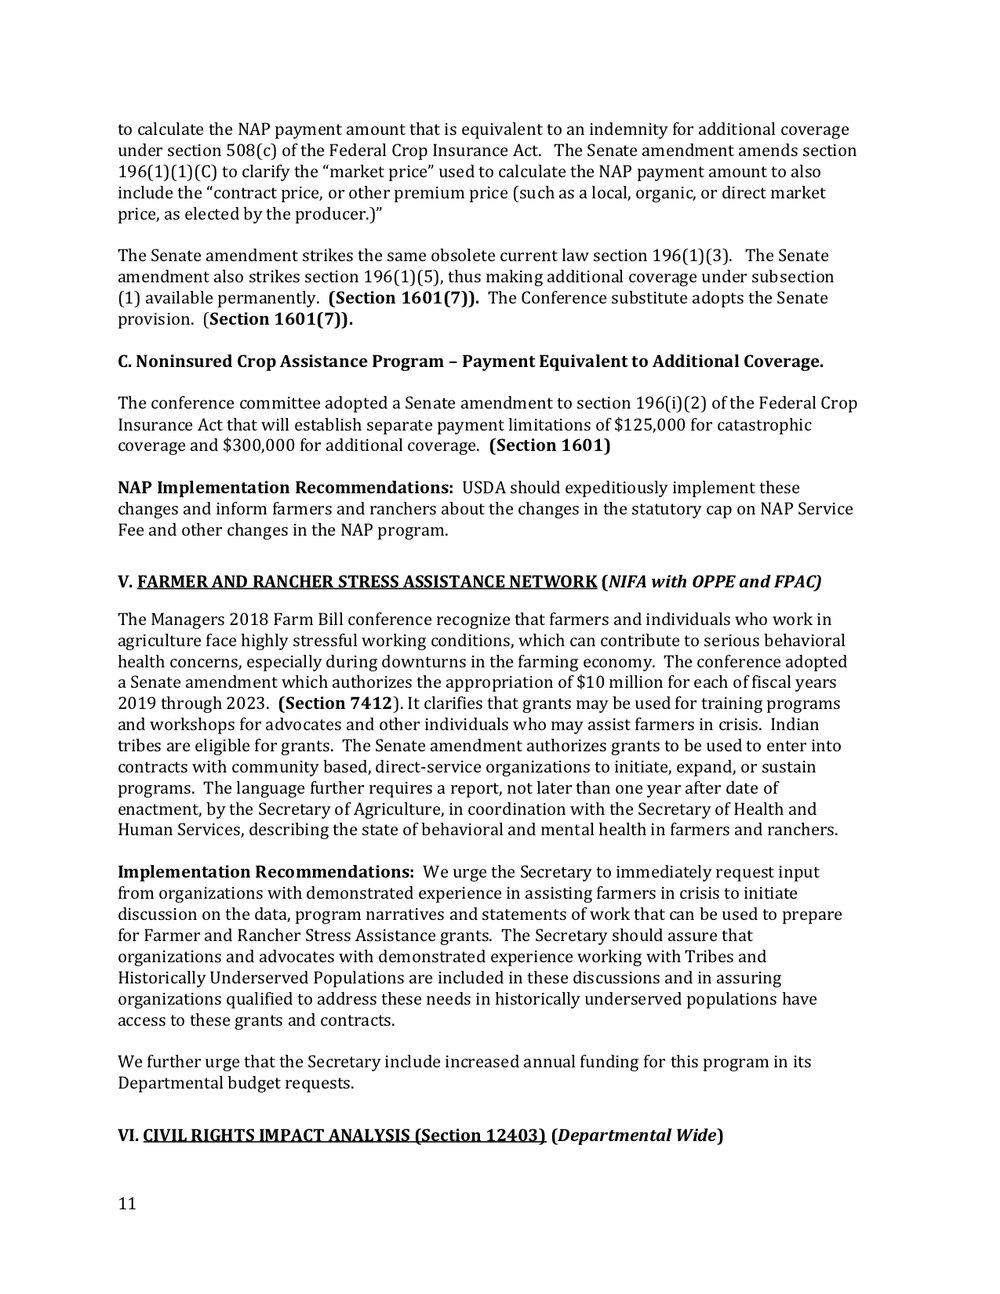 2018 Farm Bill Implementation Recommendations - Rural Co etal final March 1 page 12.jpg